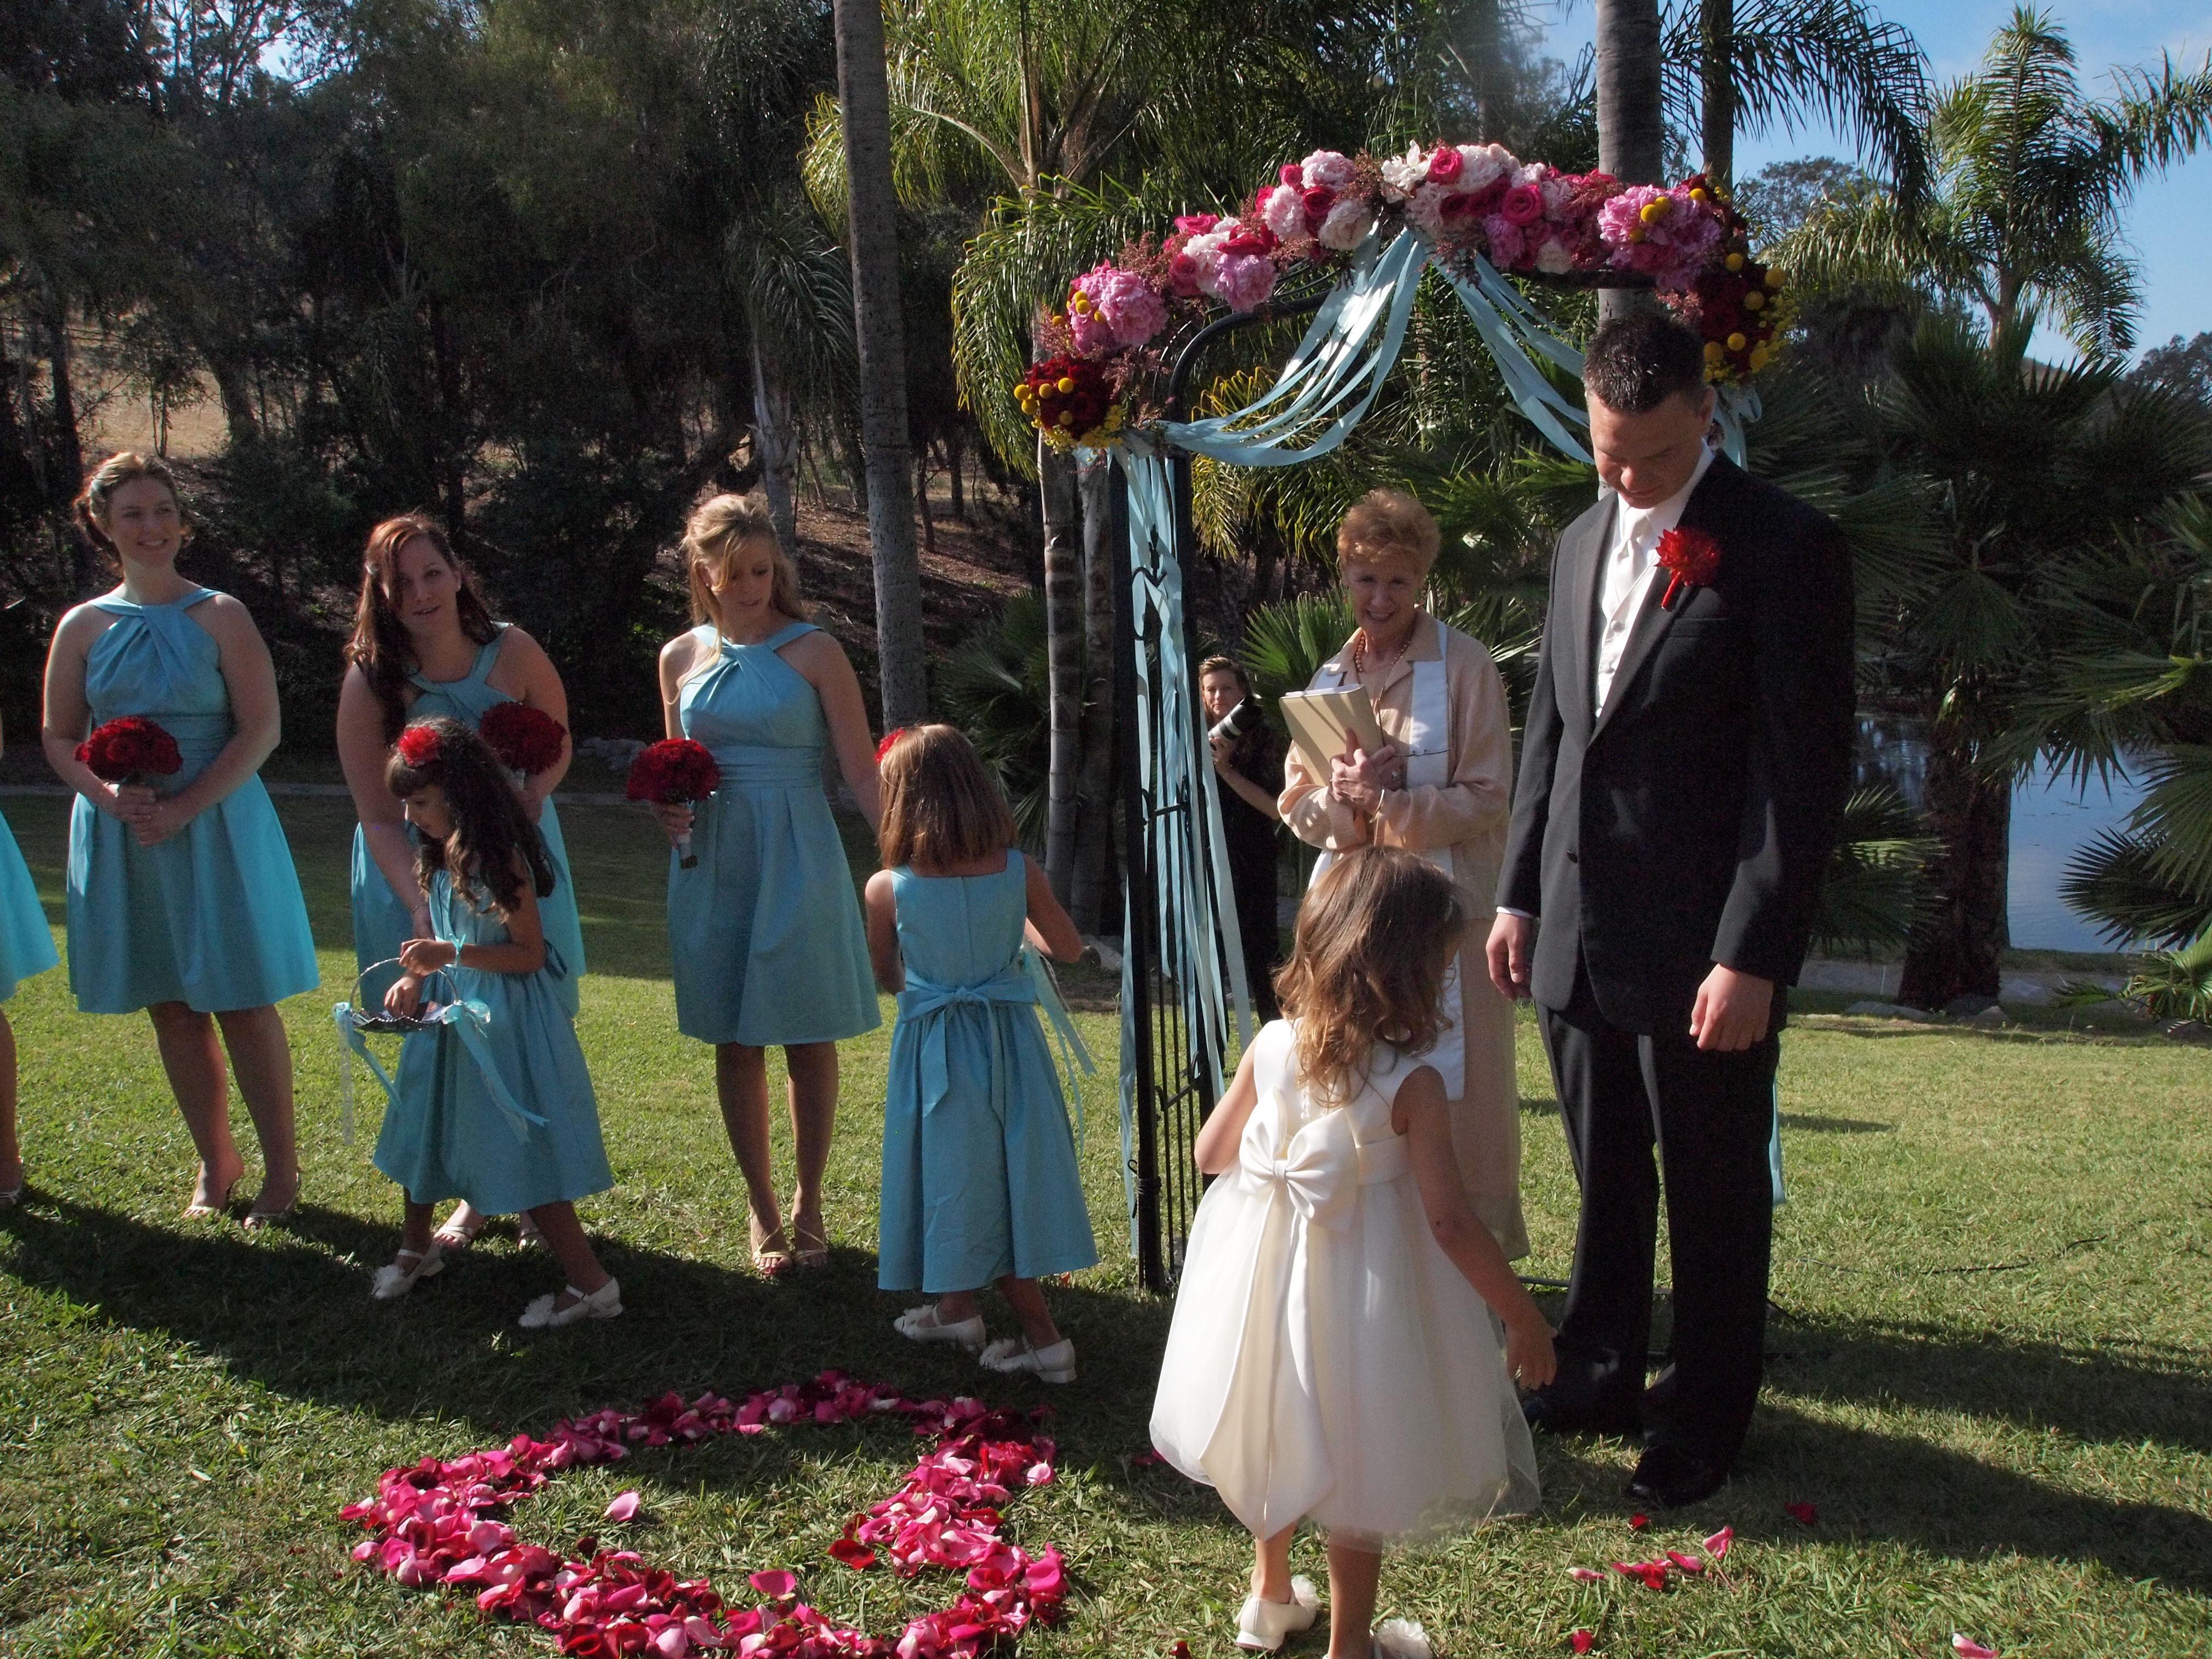 Ceremony, Flowers & Decor, Flower, Girls